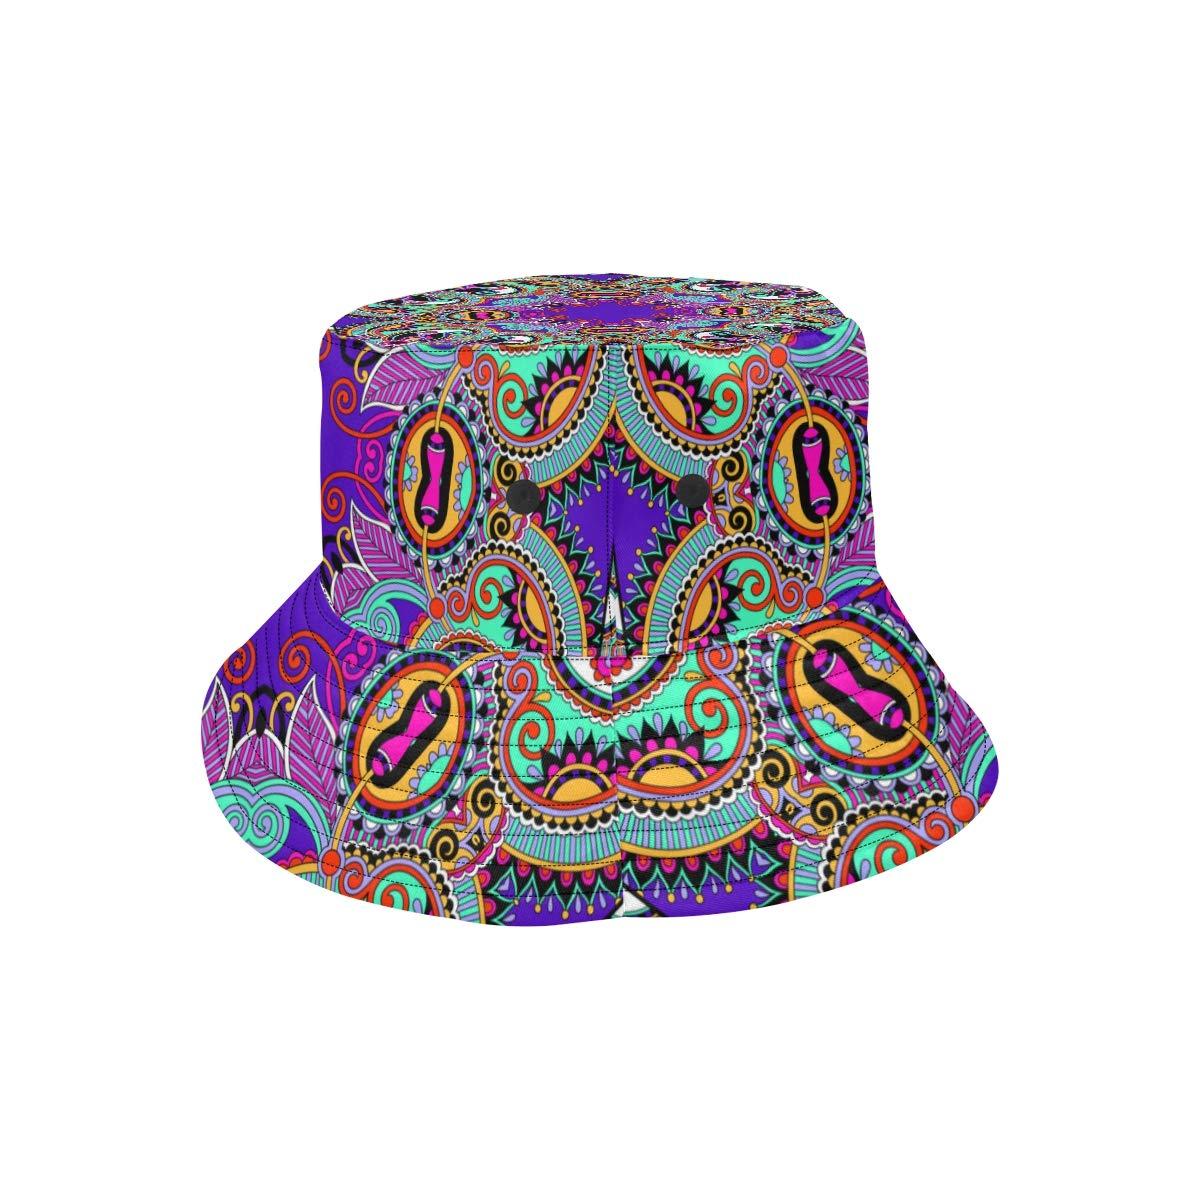 Symmetry Ethnic Popular Summer Unisex Fishing Sun Top Bucket Hats for Kid Teens Women and Men with Packable Fisherman Cap for Outdoor Baseball Sport Picnic